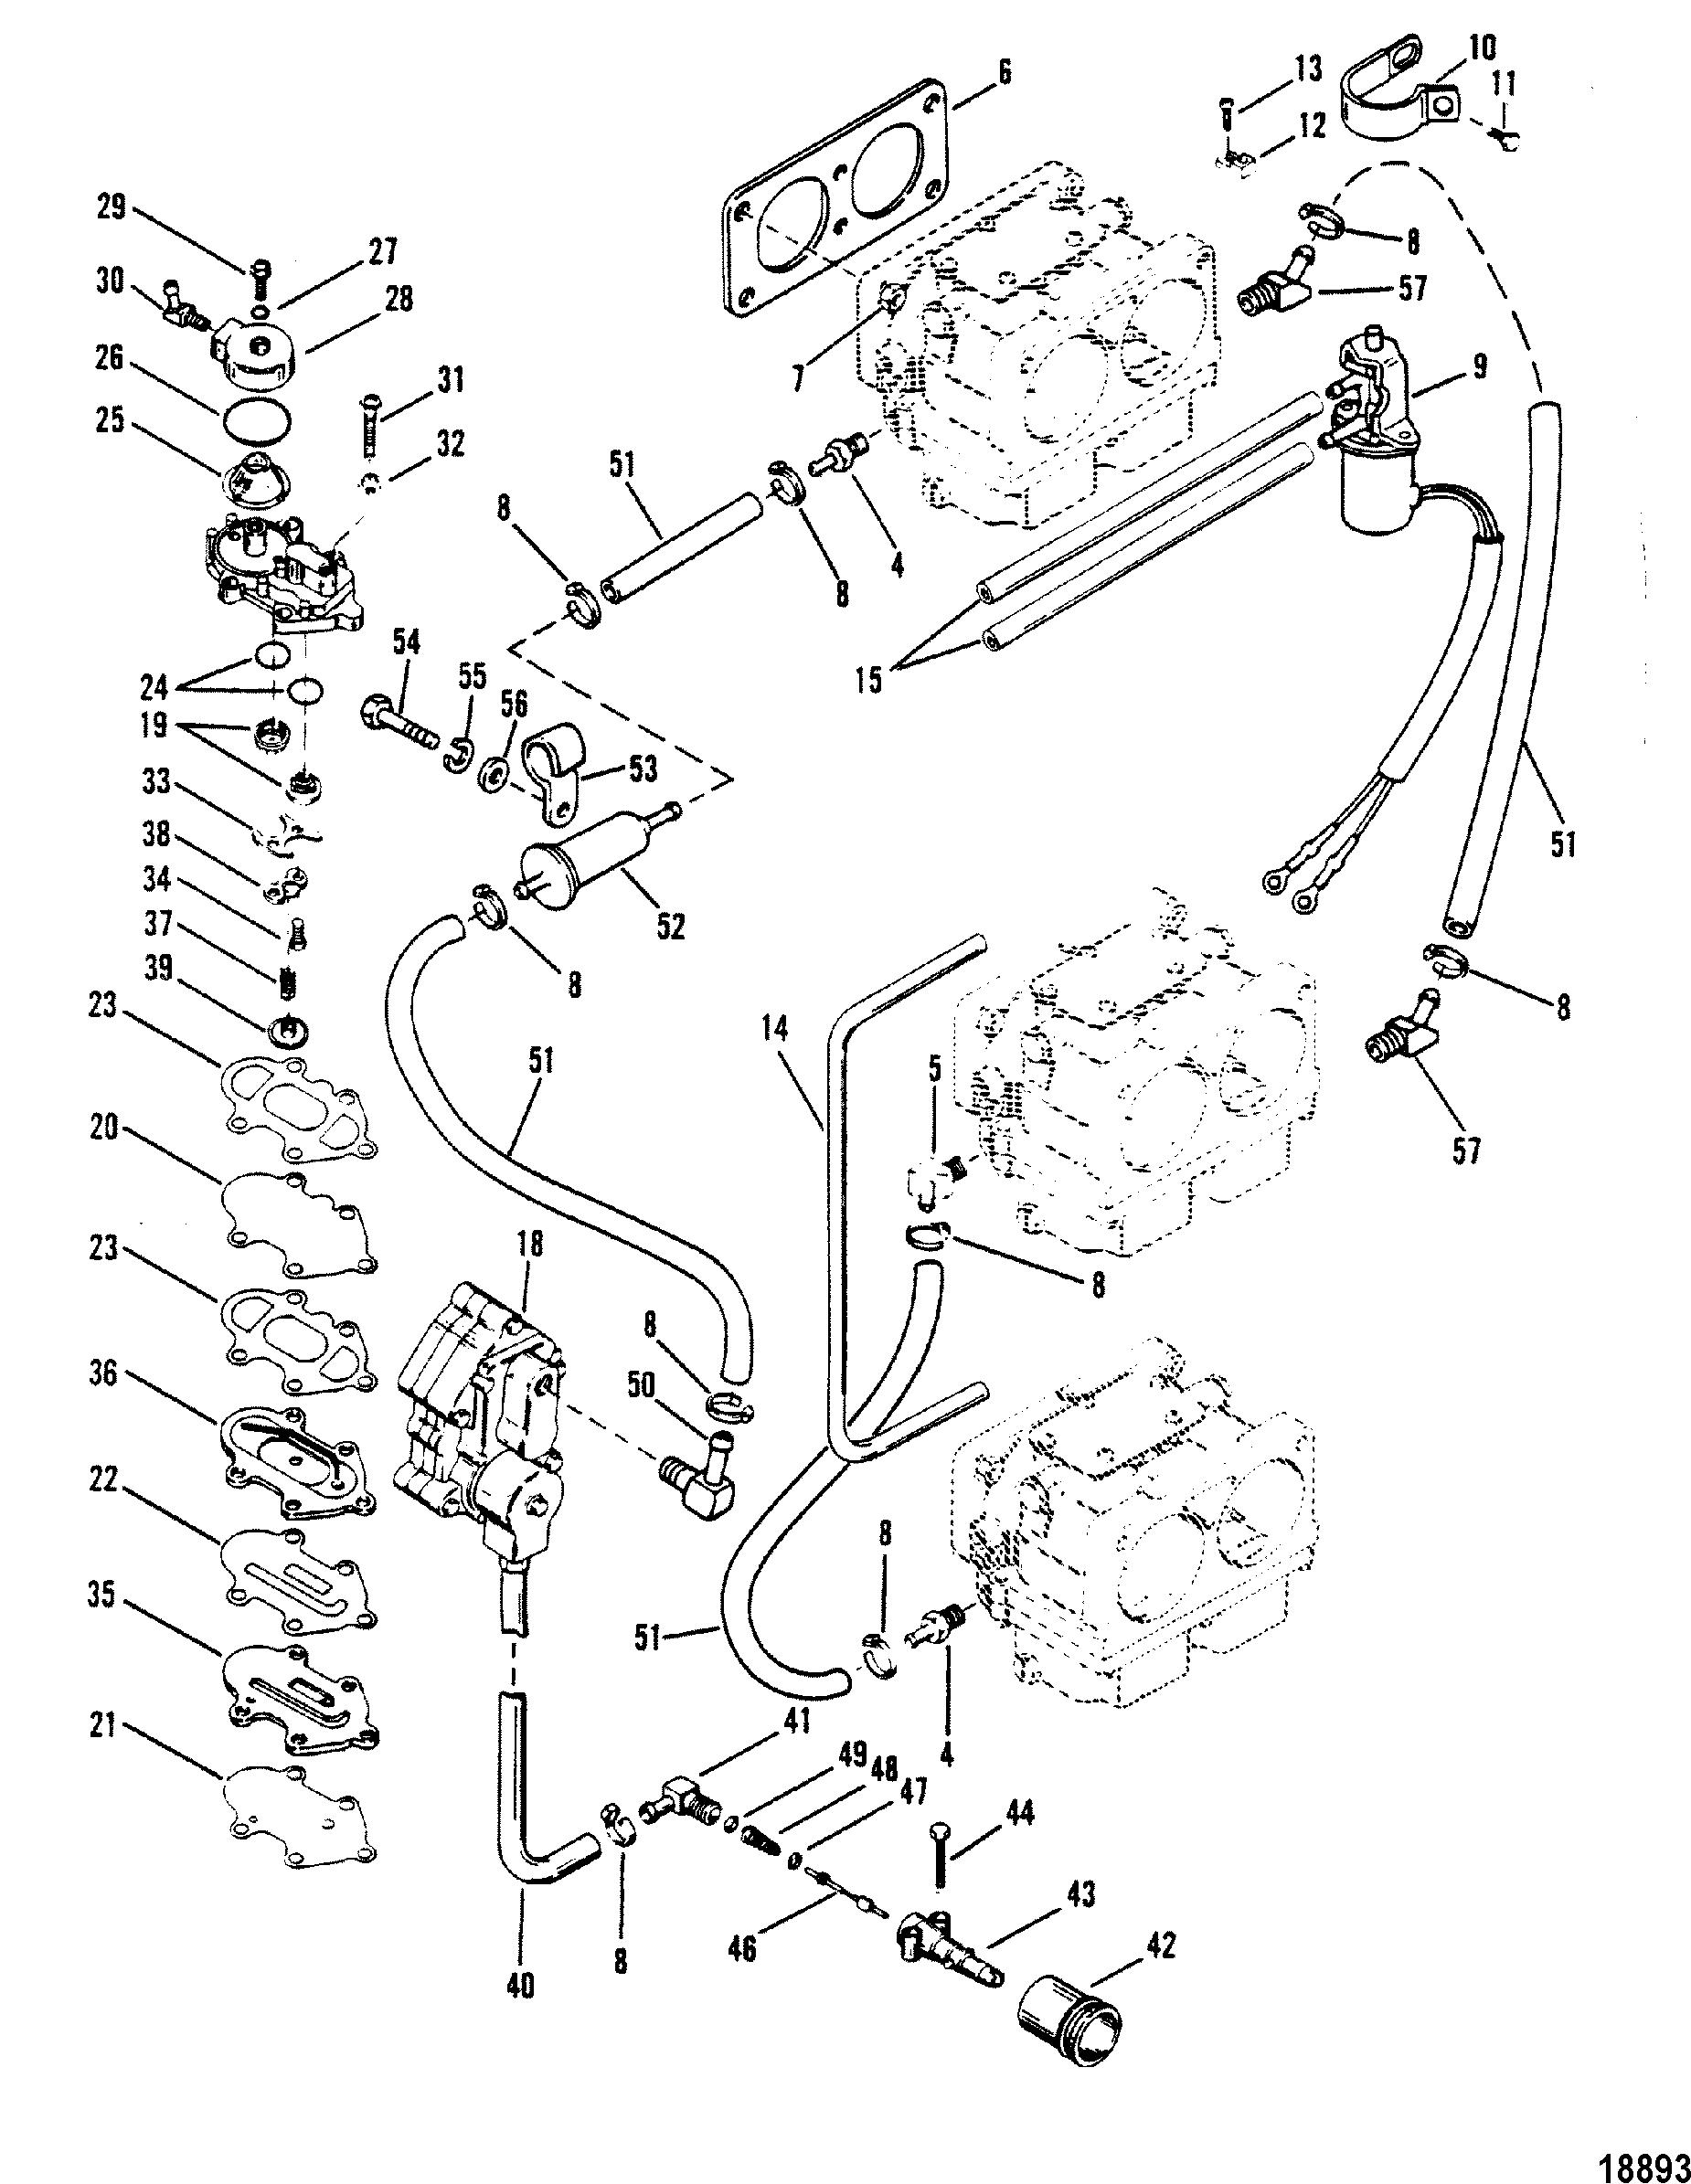 Fuel Pump Design Ii With Inline Filter For Mariner